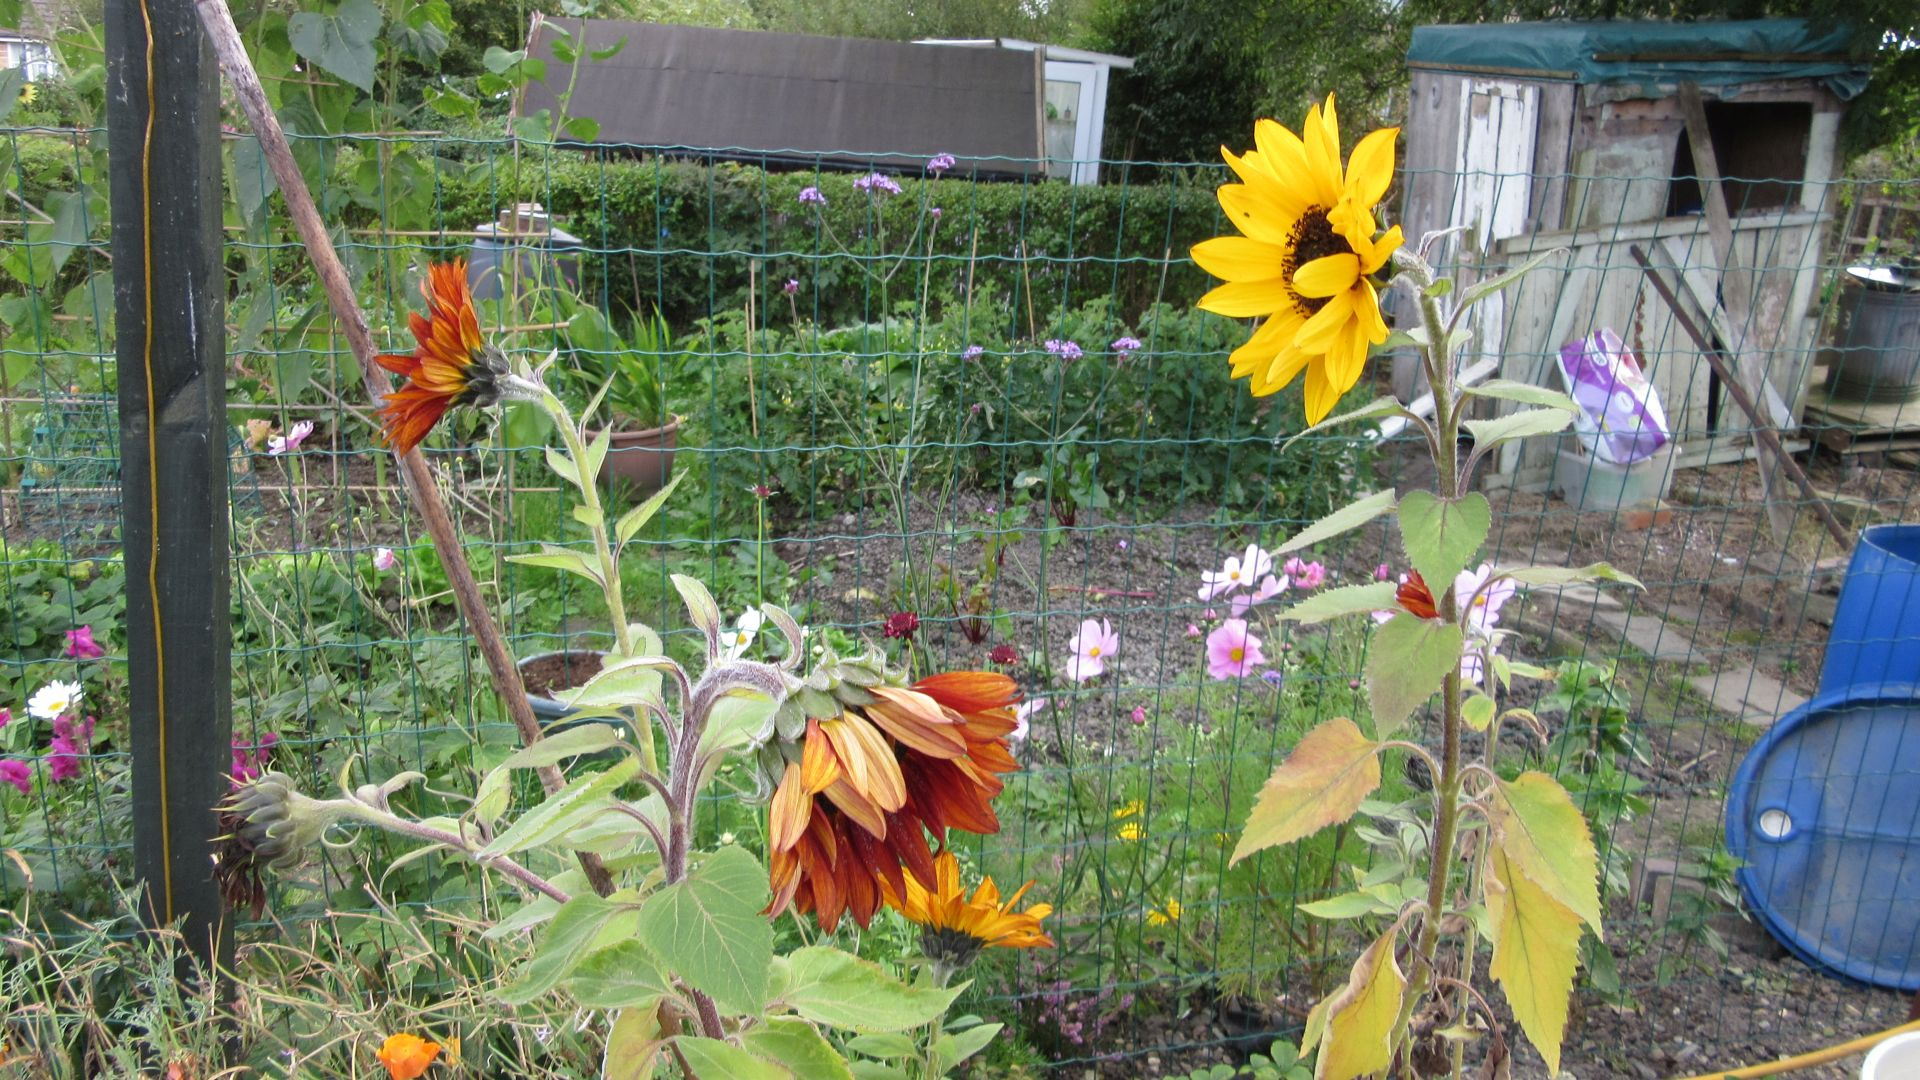 sep27_sunflowers1